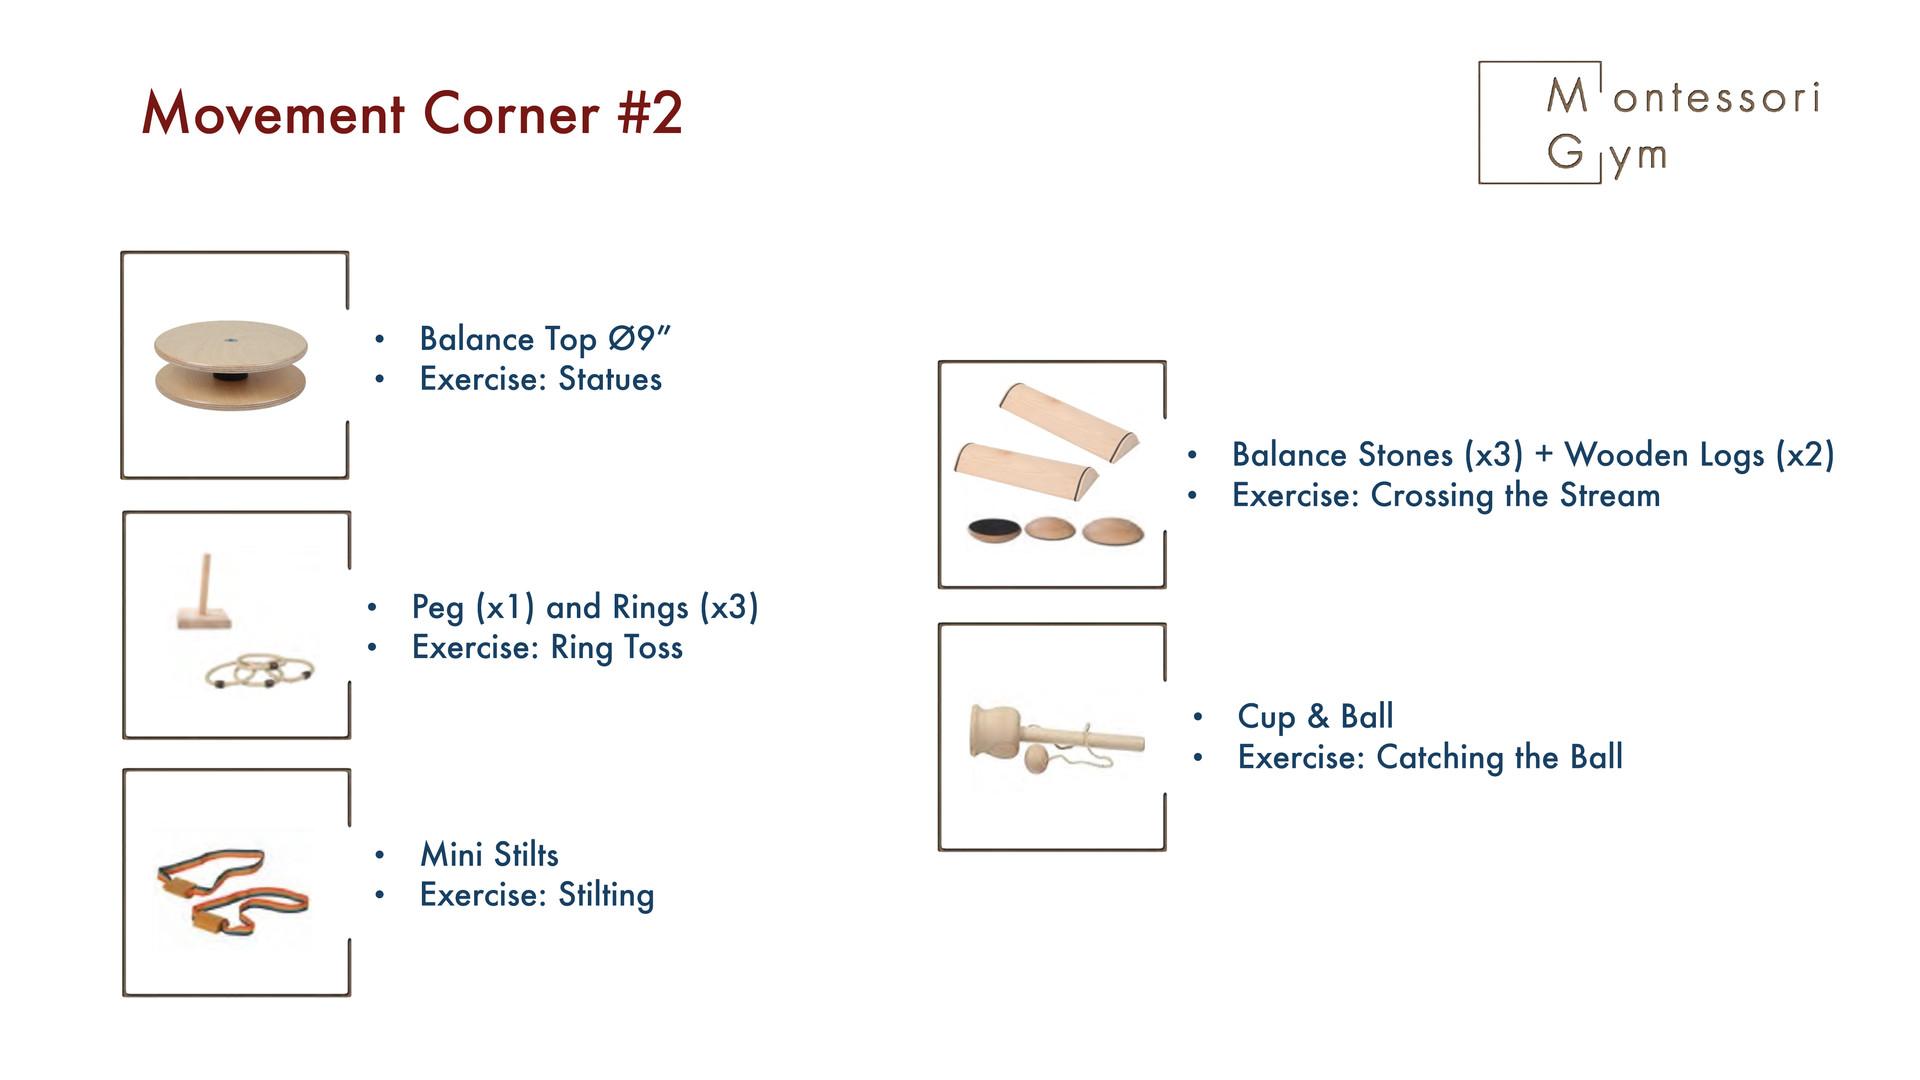 Movement Corner #2